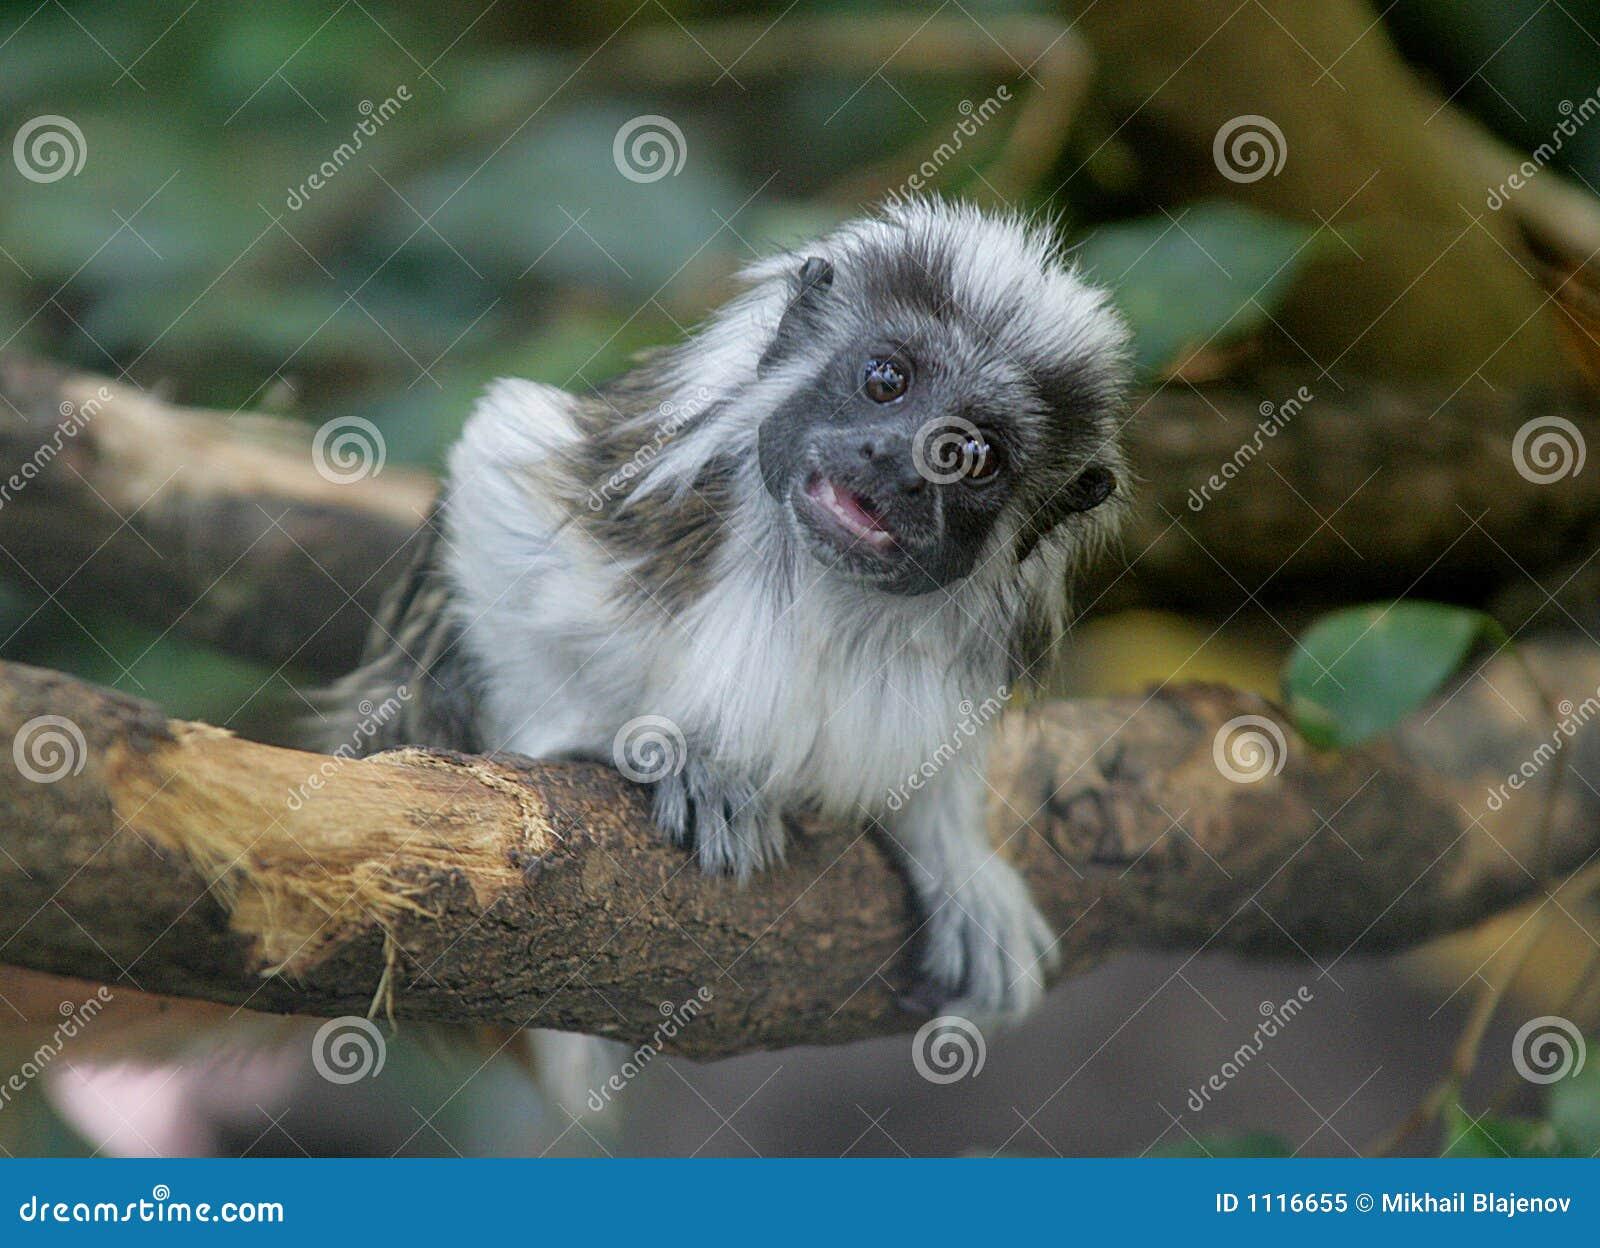 small monkey 2 royalty free stock photo image 1116655